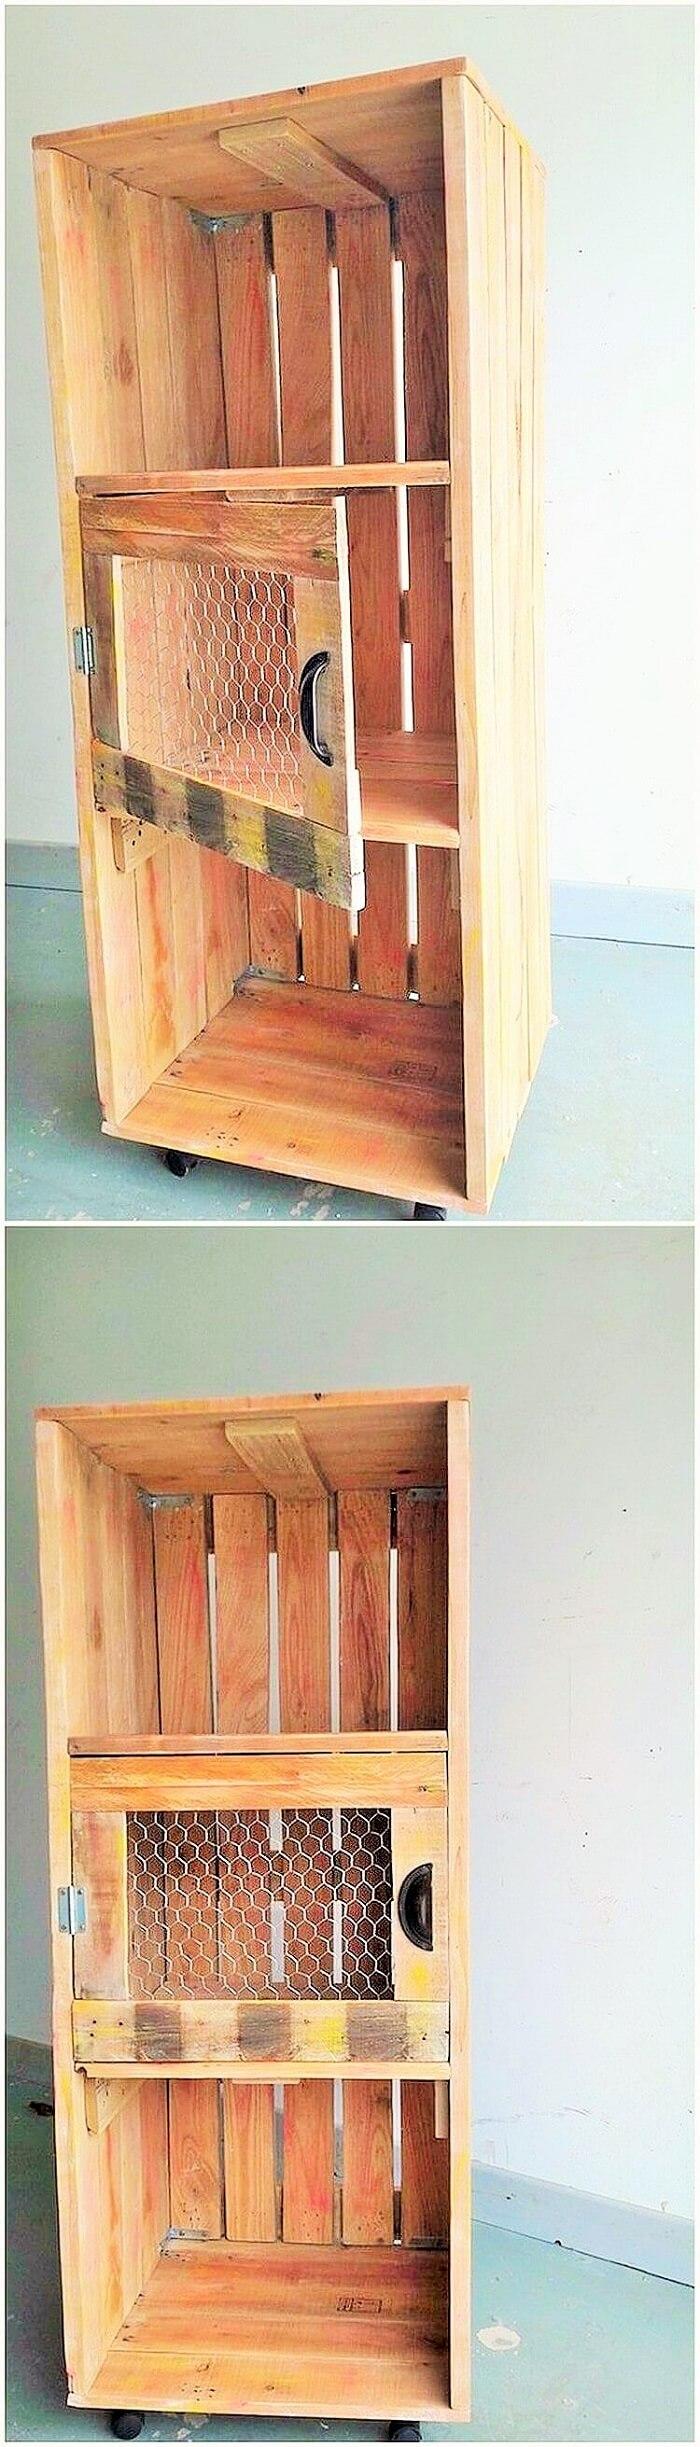 Wood-Pallet-Cabinet-Ideas